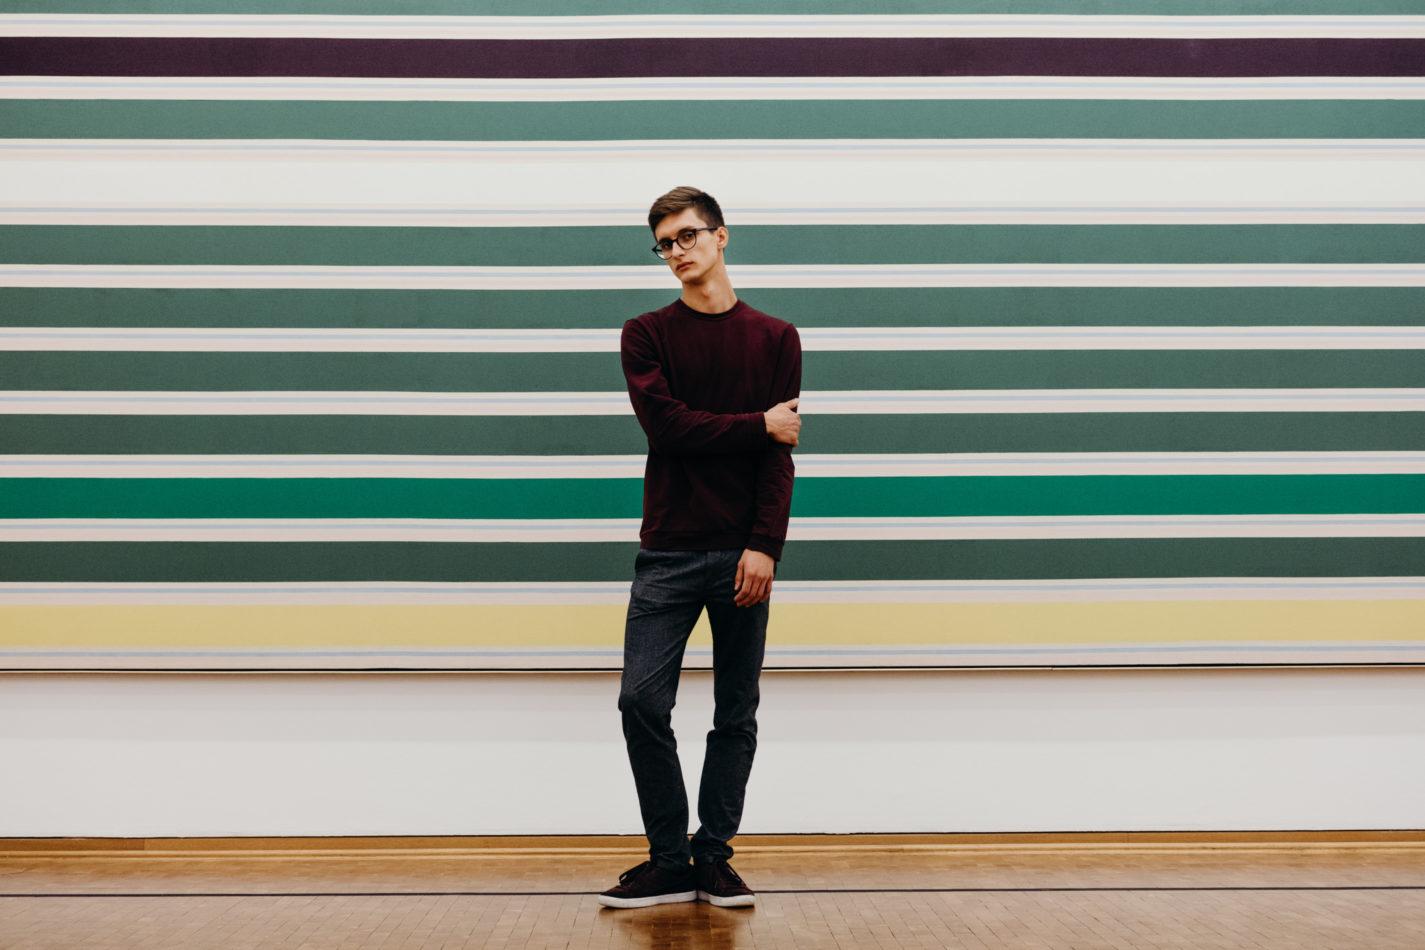 sistart köln mann porträt portrait museum streifen posing